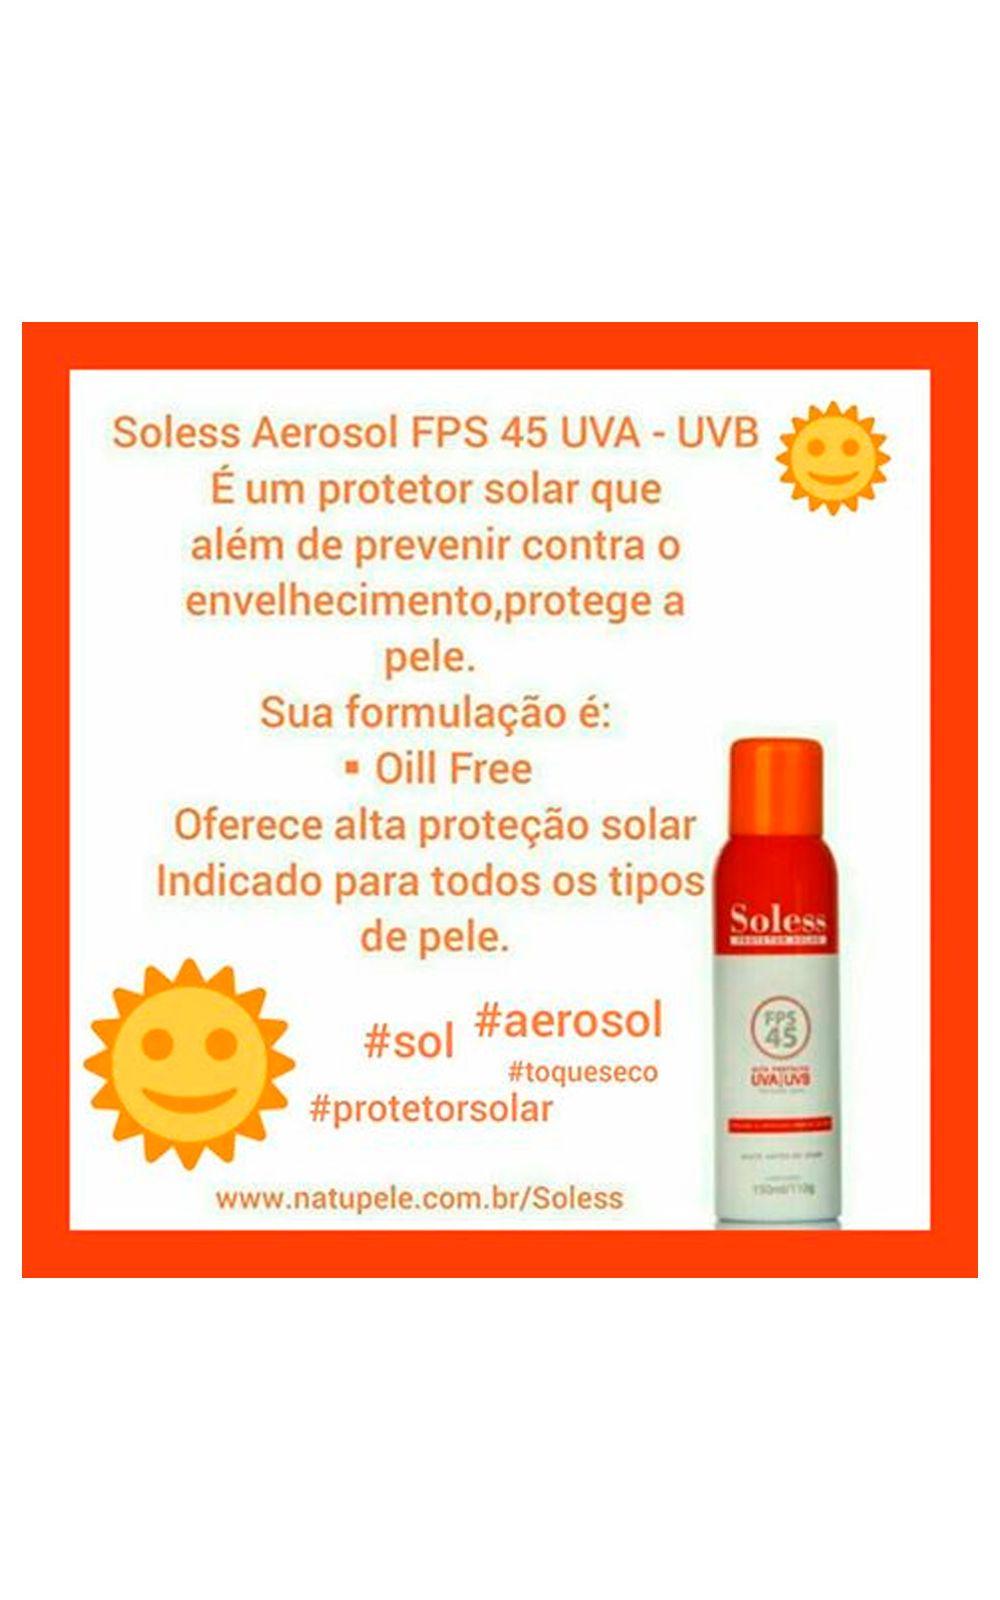 Foto 2 - Protetor Solar Natupele Soless FPS 45 Aerosol - 120g